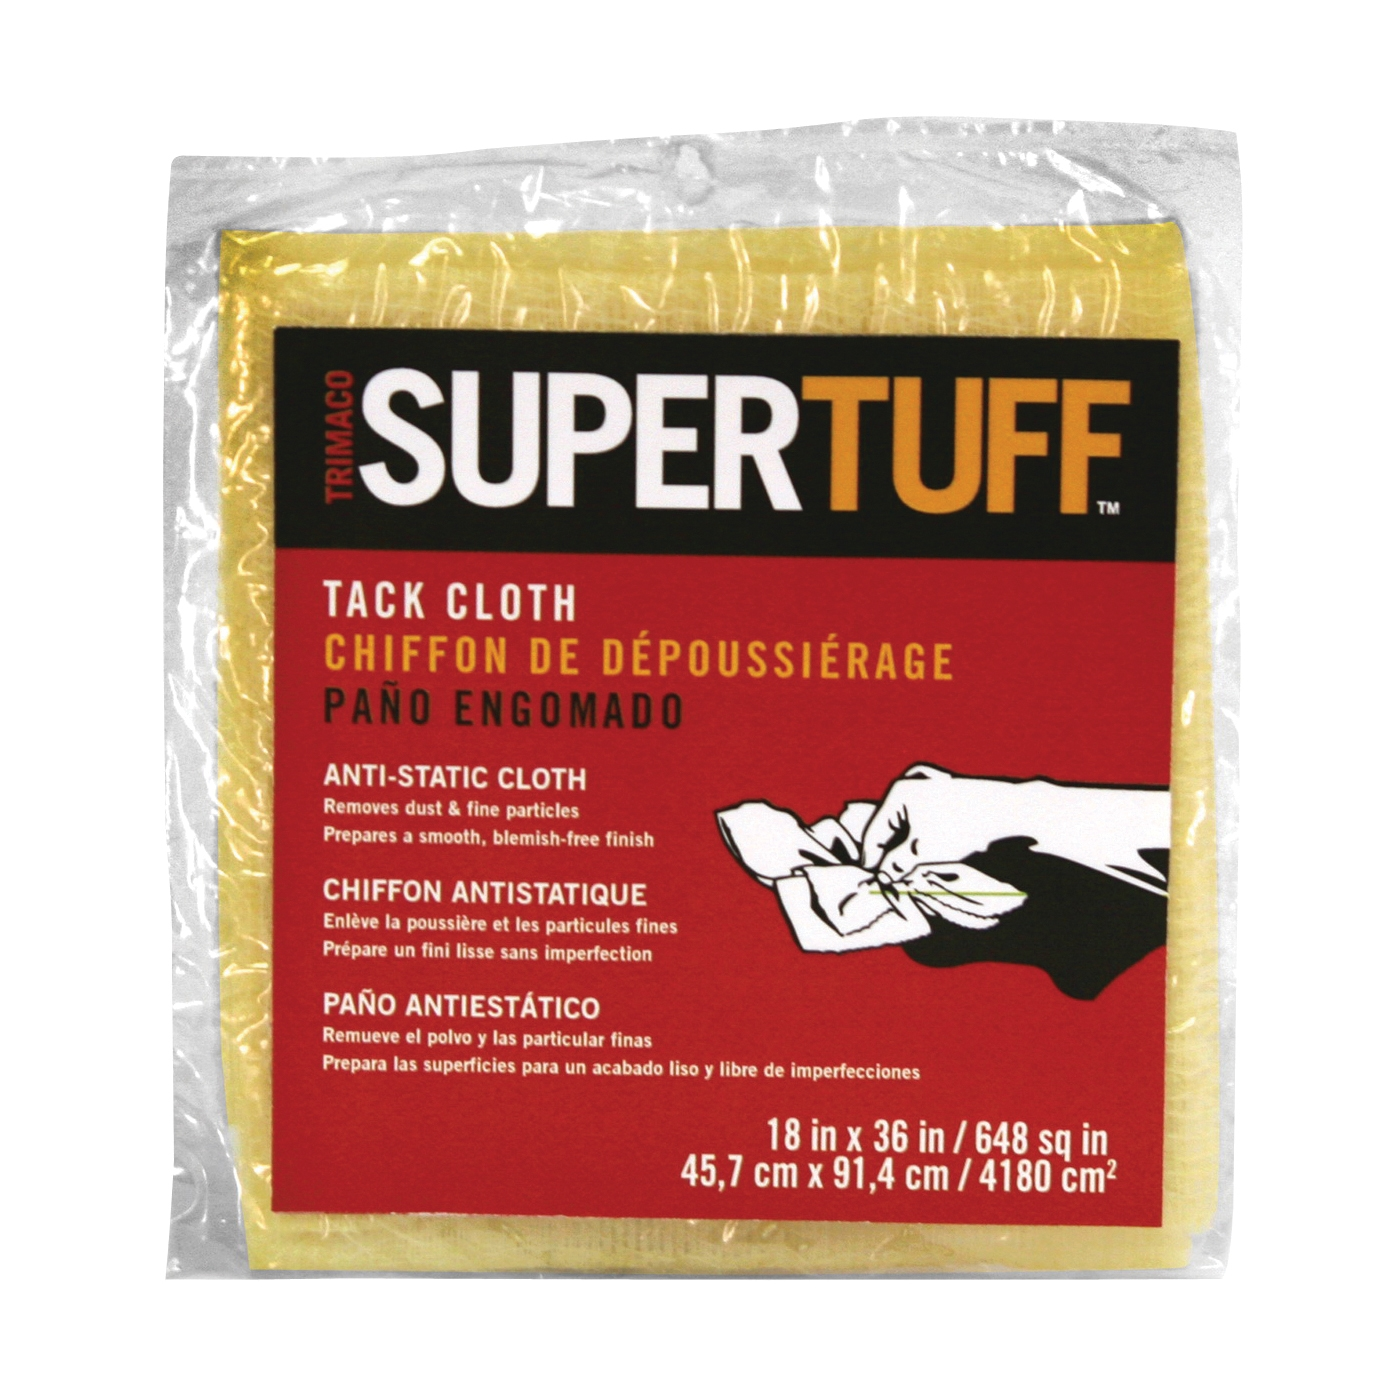 Picture of Trimaco SUPERTUFF 10501 Tack Cloth, 18 in L, 36 in W, Cotton